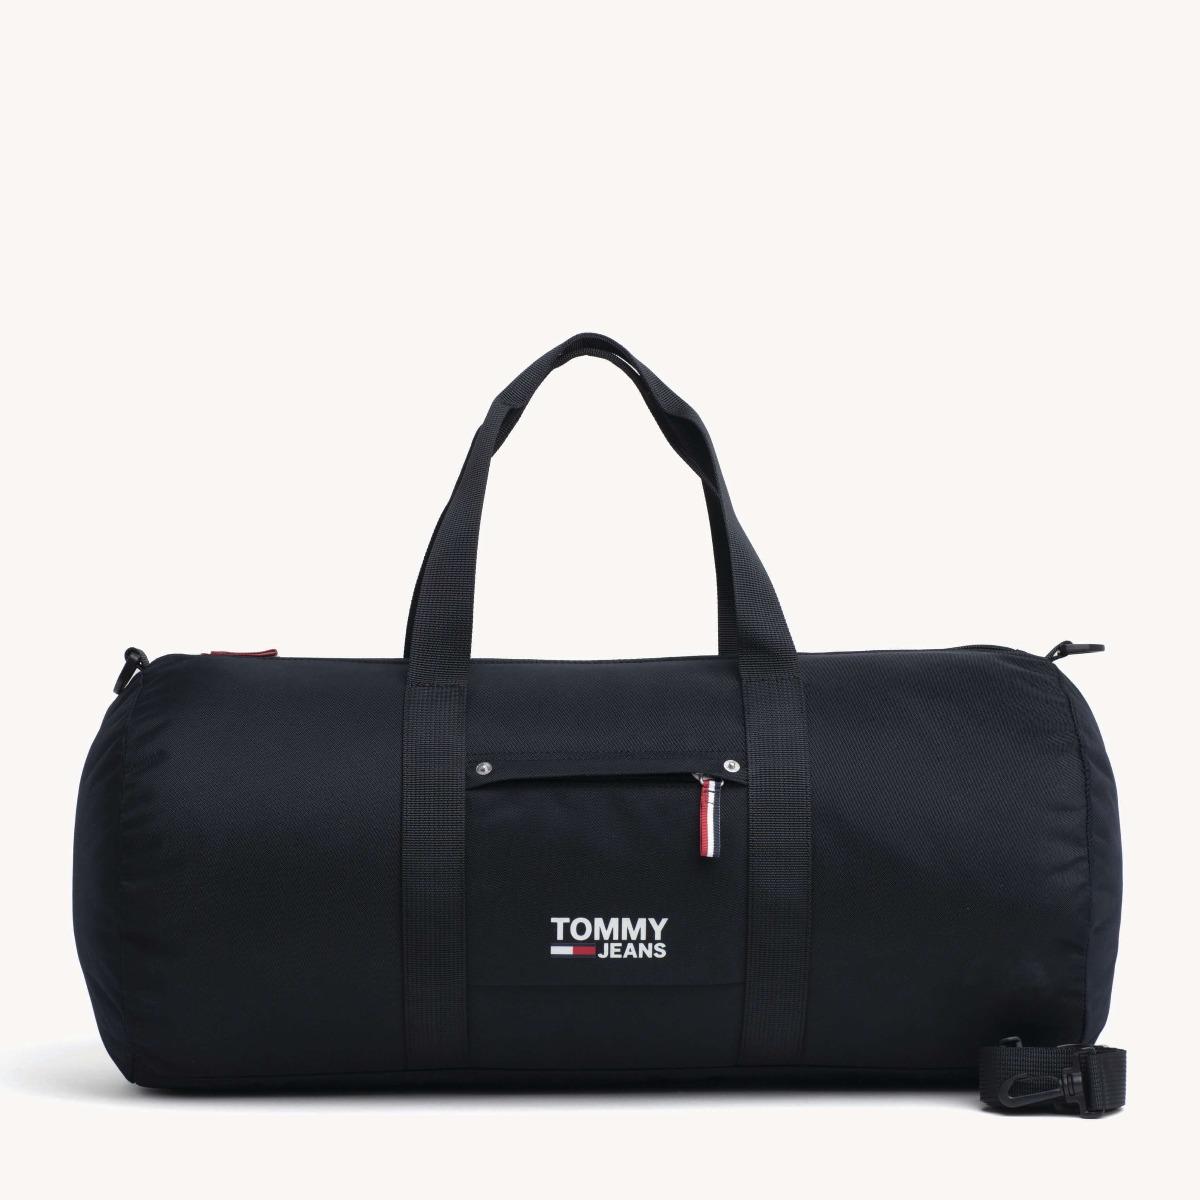 Shop Tommy Jeans Bags